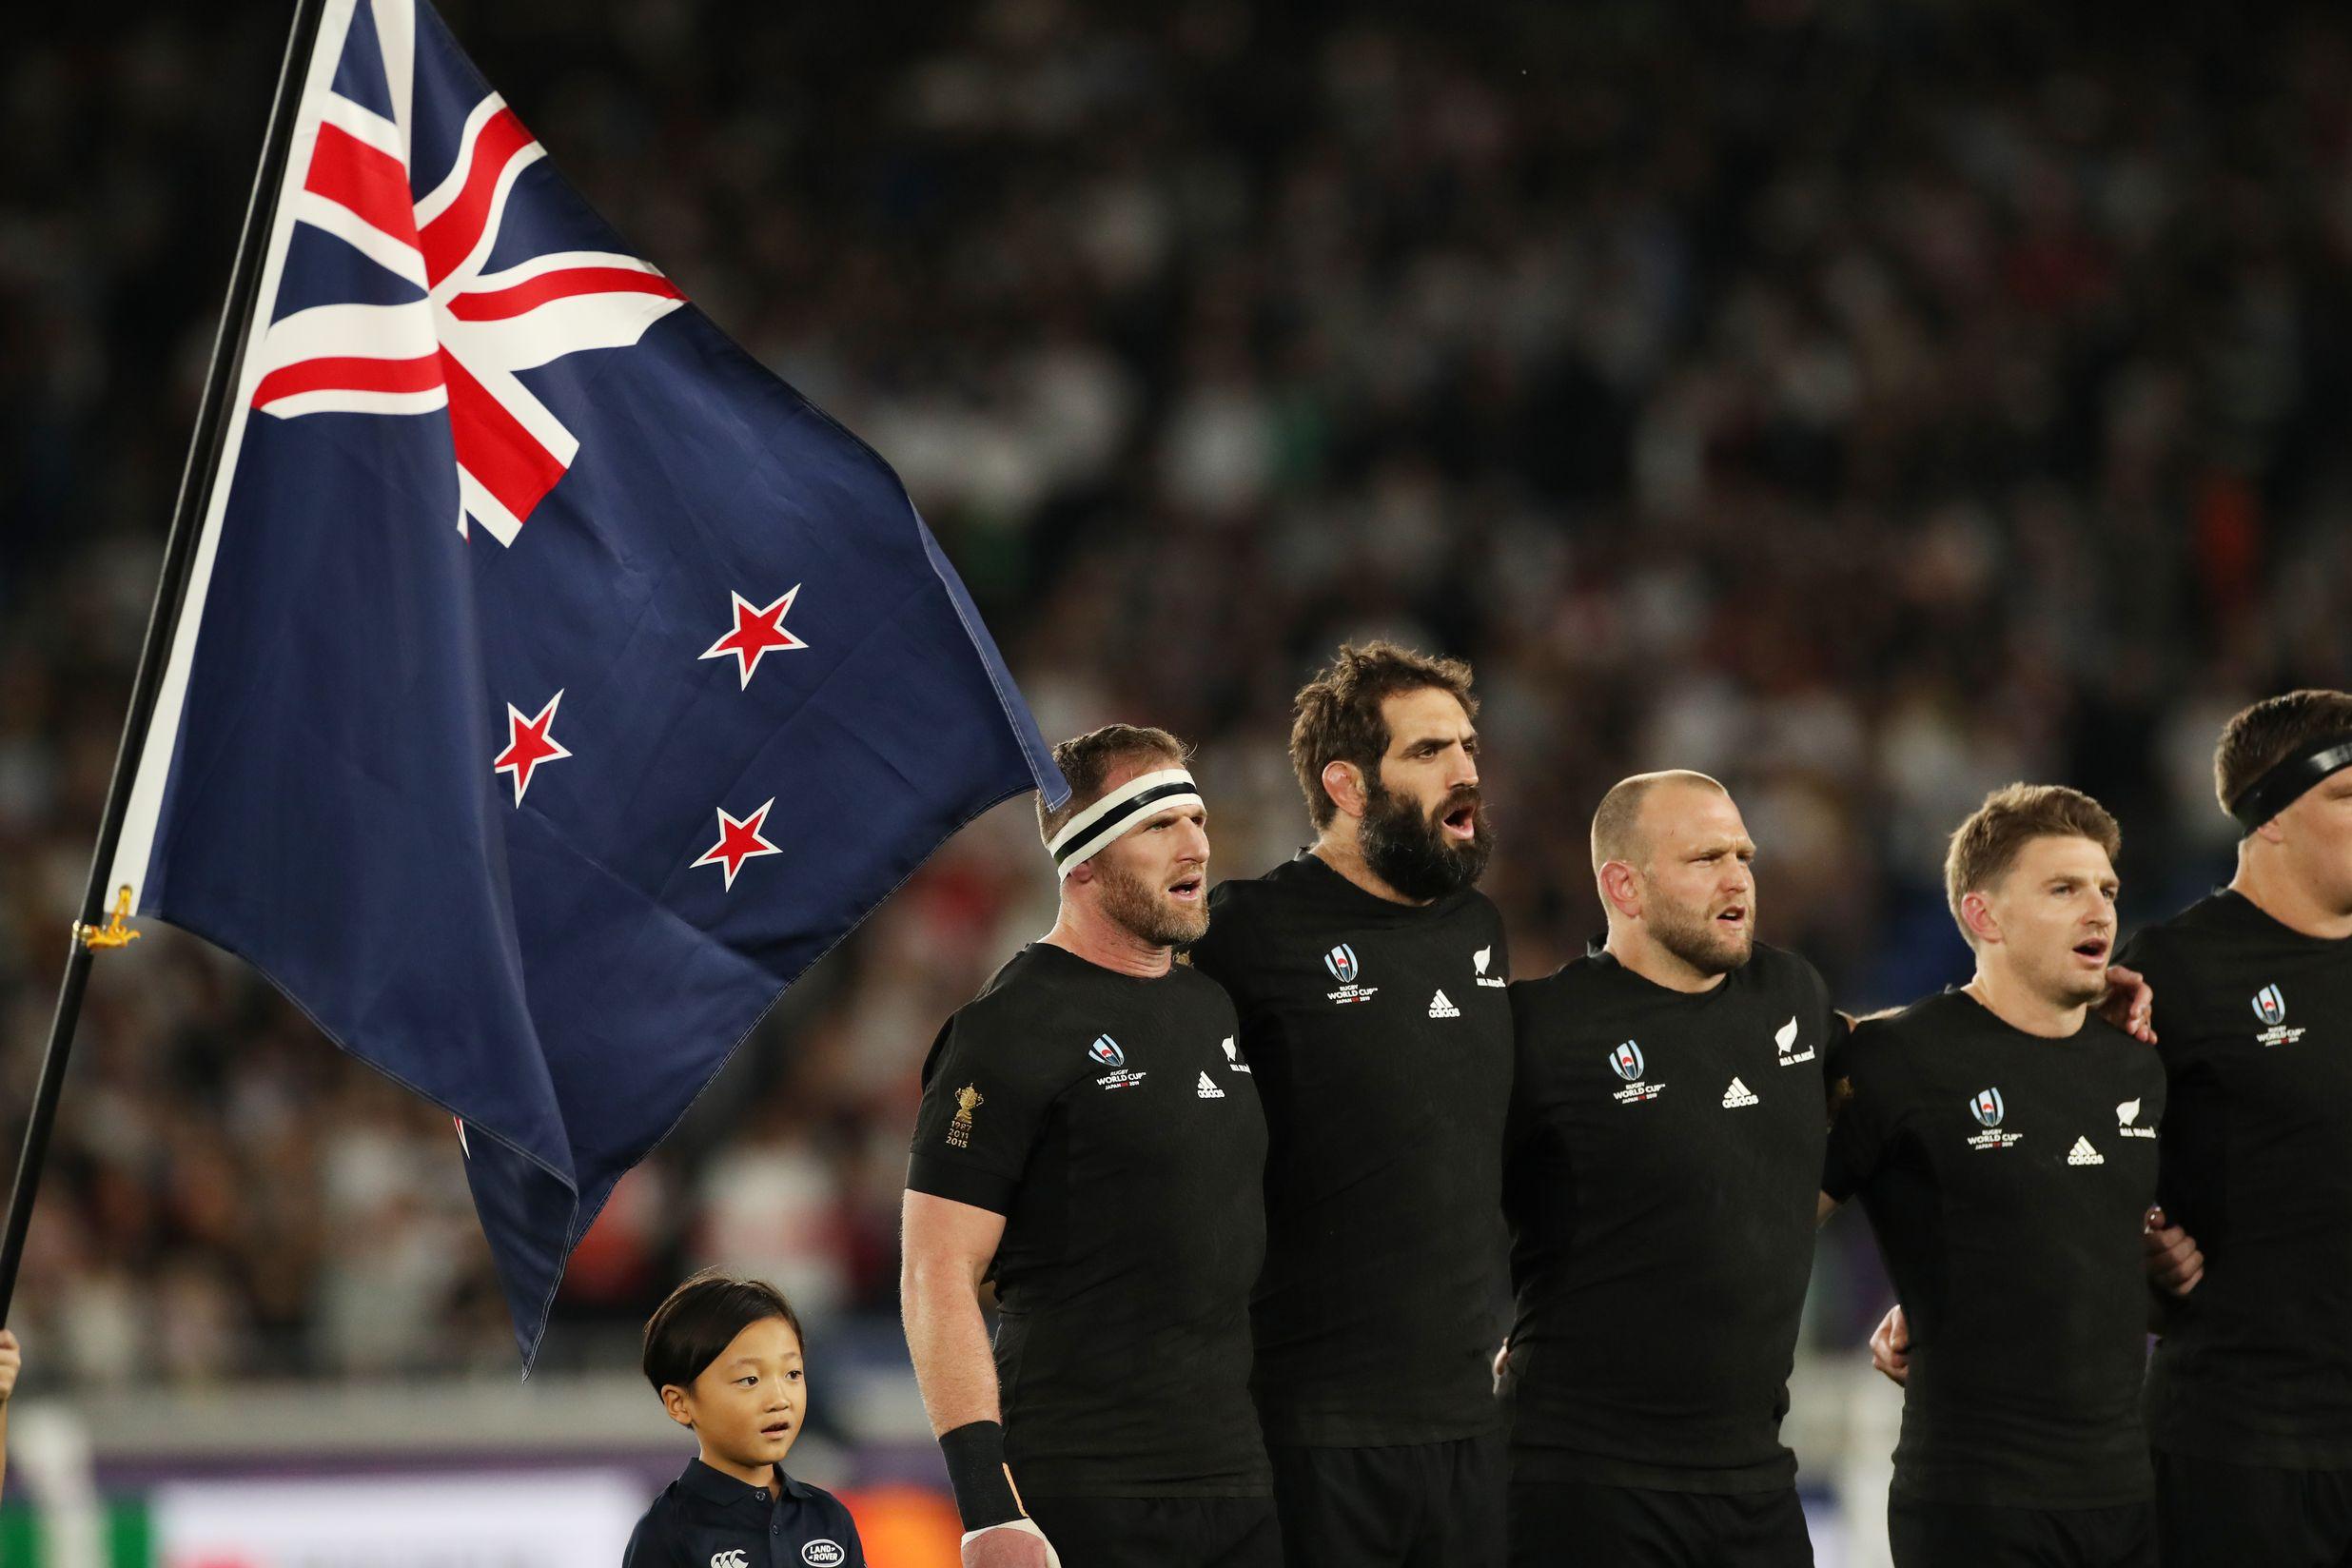 Rugby - Coronavirus: Les All Blacks vont (aussi) baisser leurs salaires